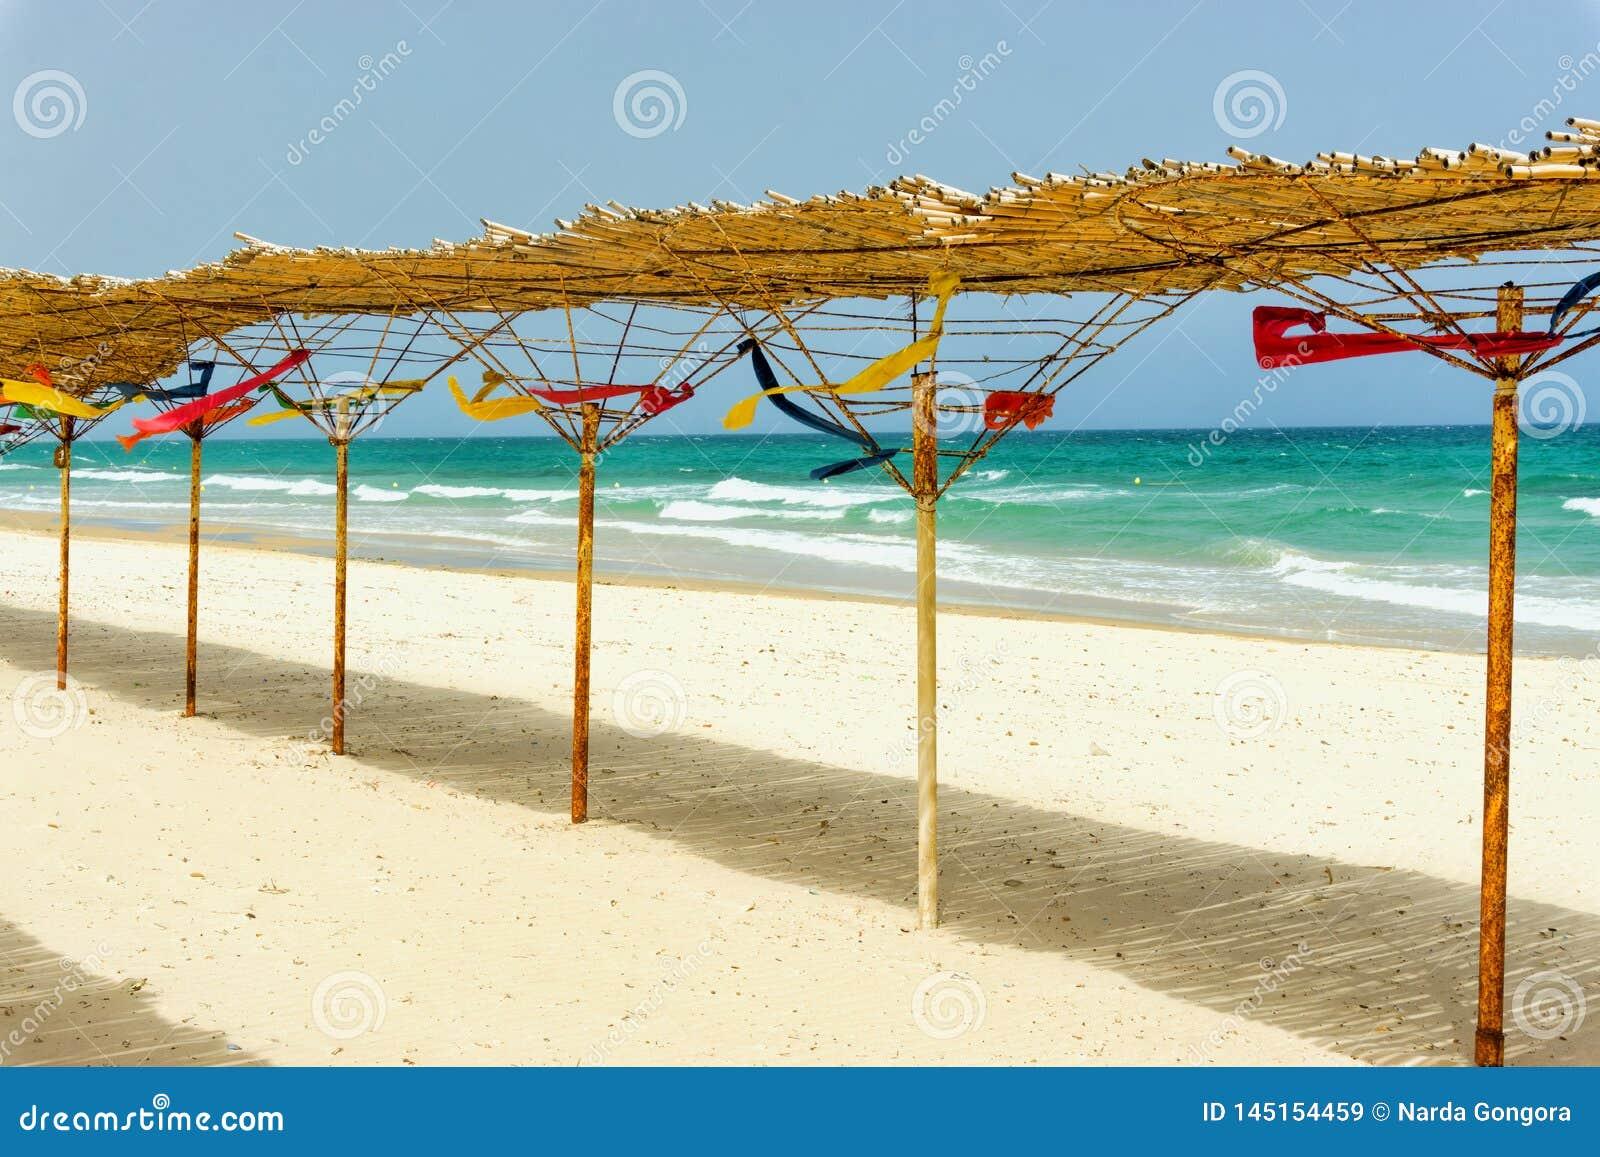 Landscape of Sousse Beach in Tunisia